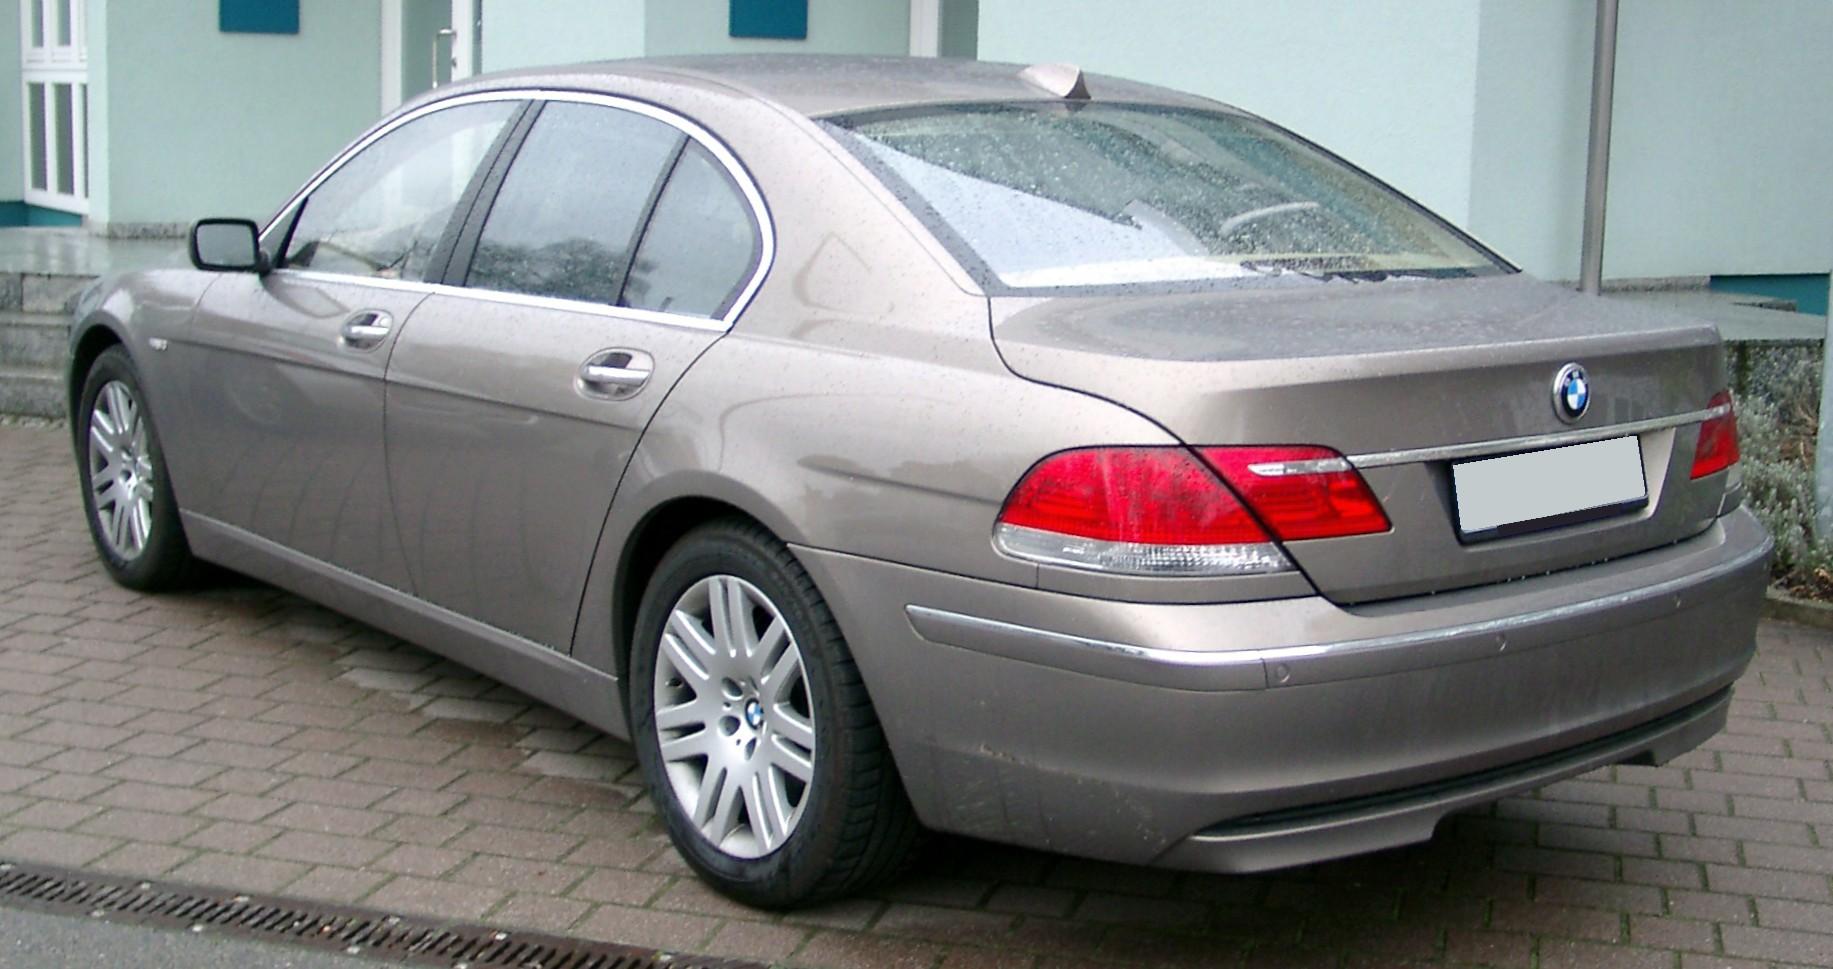 Image Of Bmw Sports Car